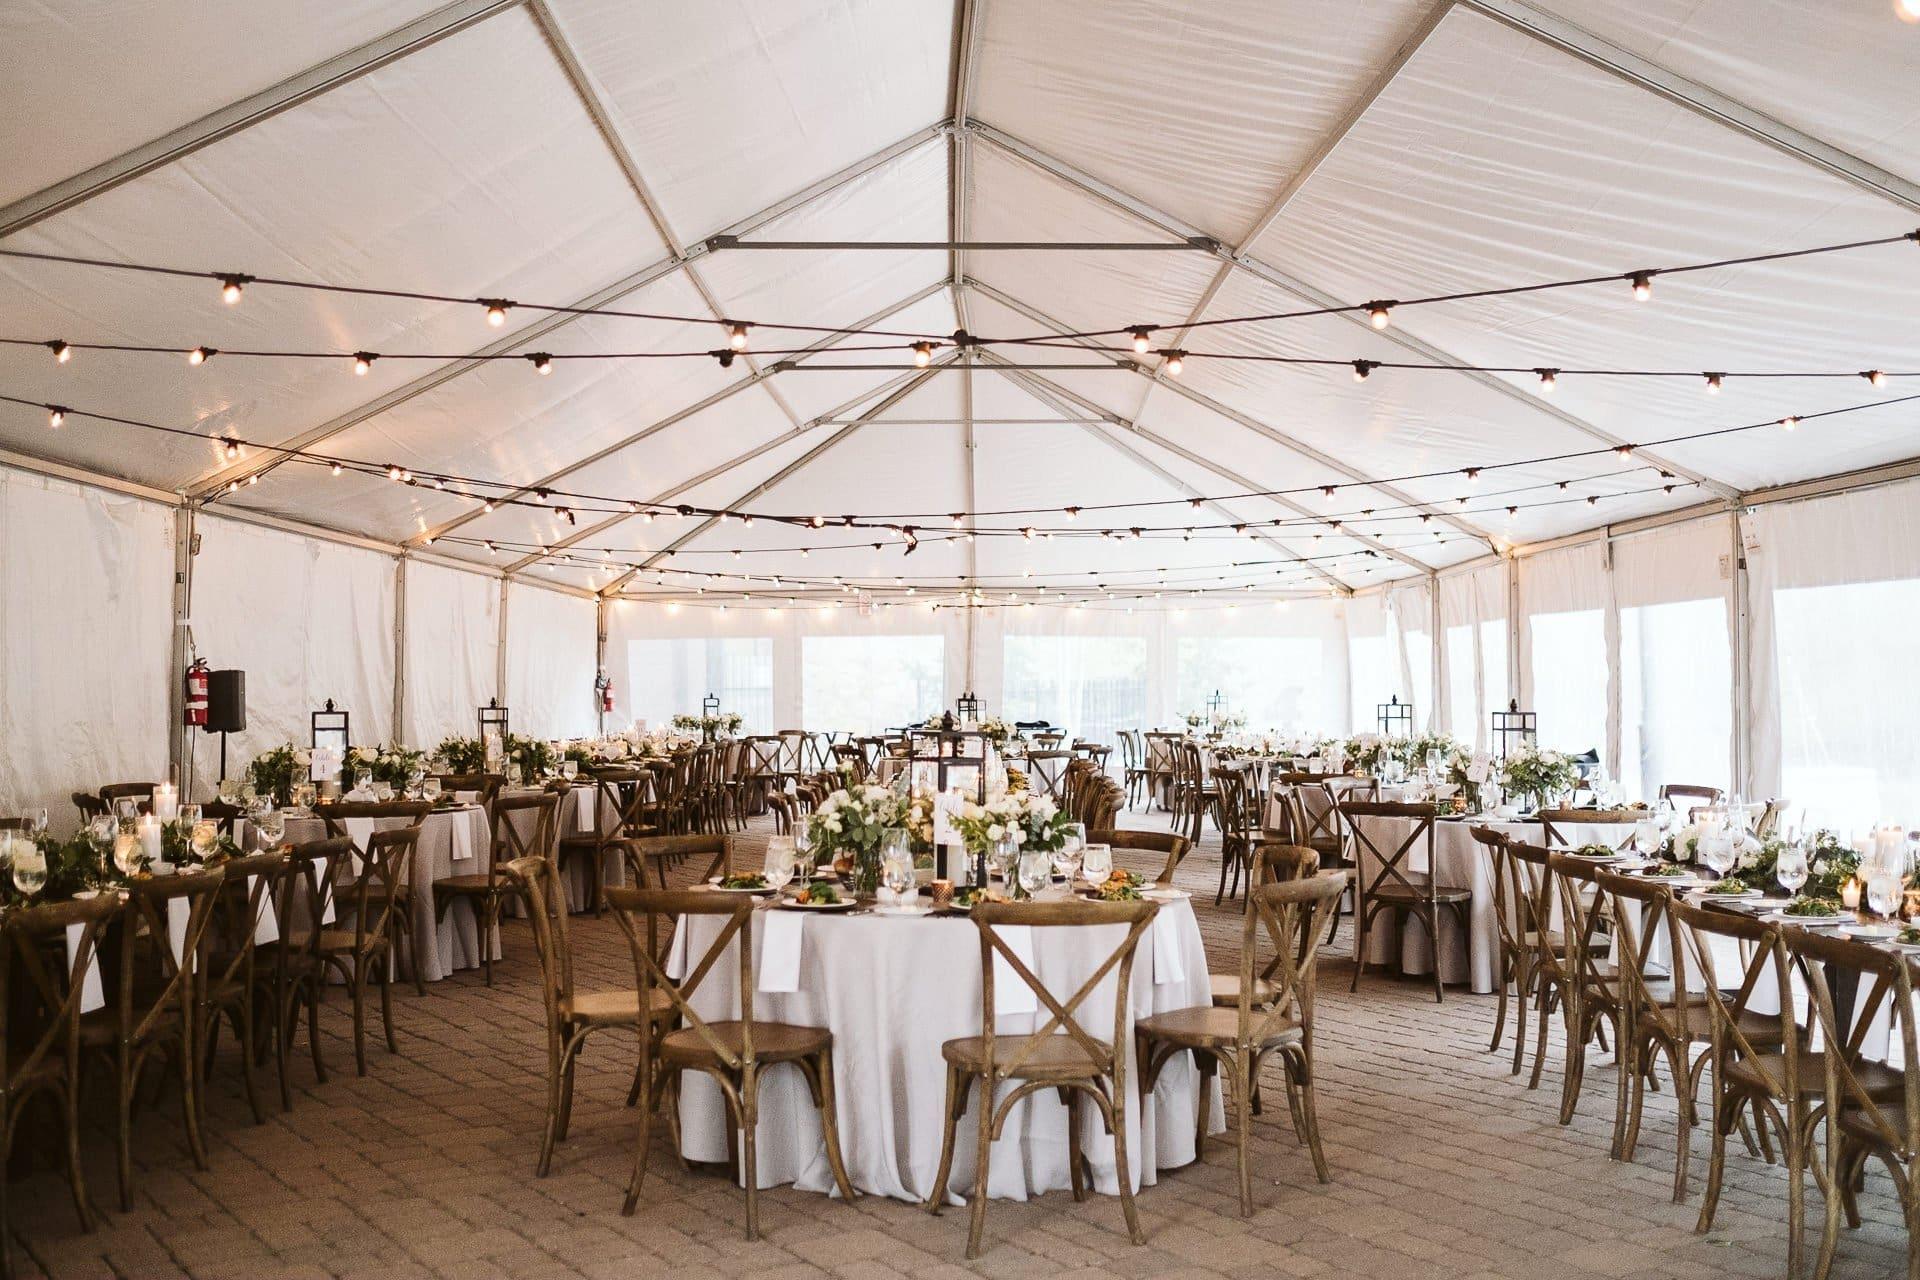 White tent wedding reception at Sevens at Breckenridge ski resort, Colorado mountain wedding